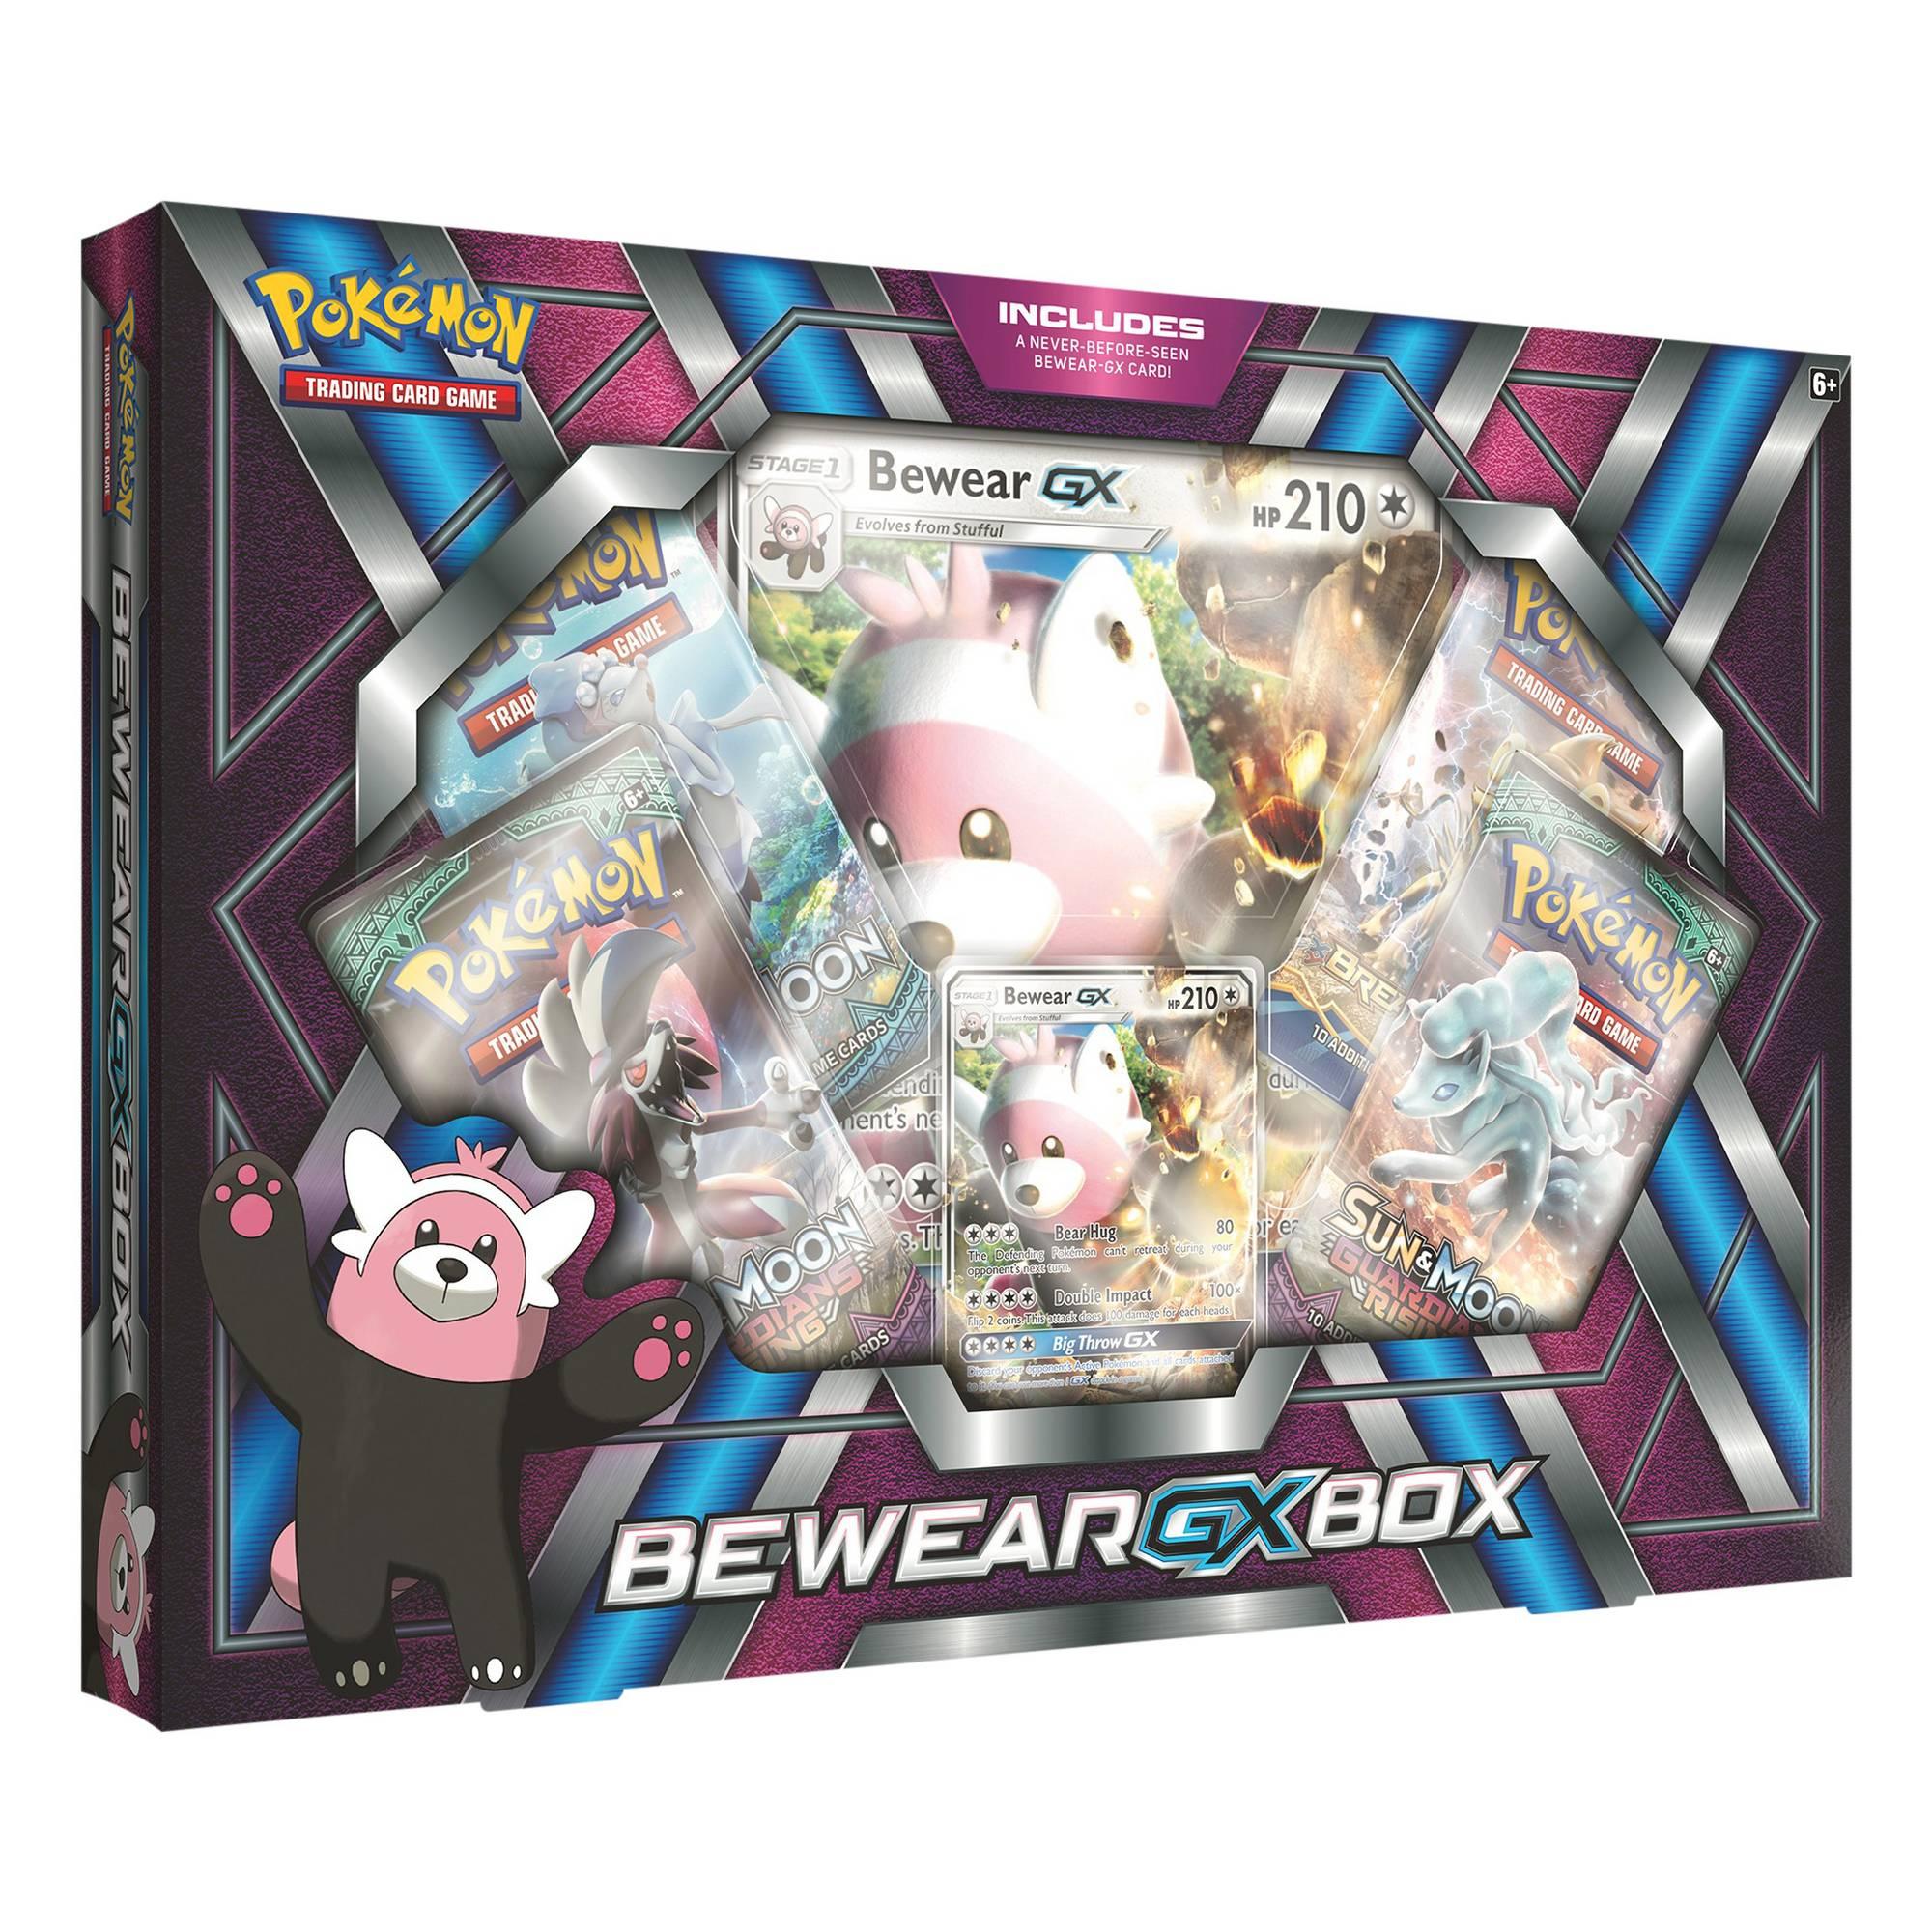 Pokemon Tcg Bewear Gx Premium Collection Bundle Box Plus Free Walmart 5x9 Pocket Page Protectors Walmart Com Walmart Com